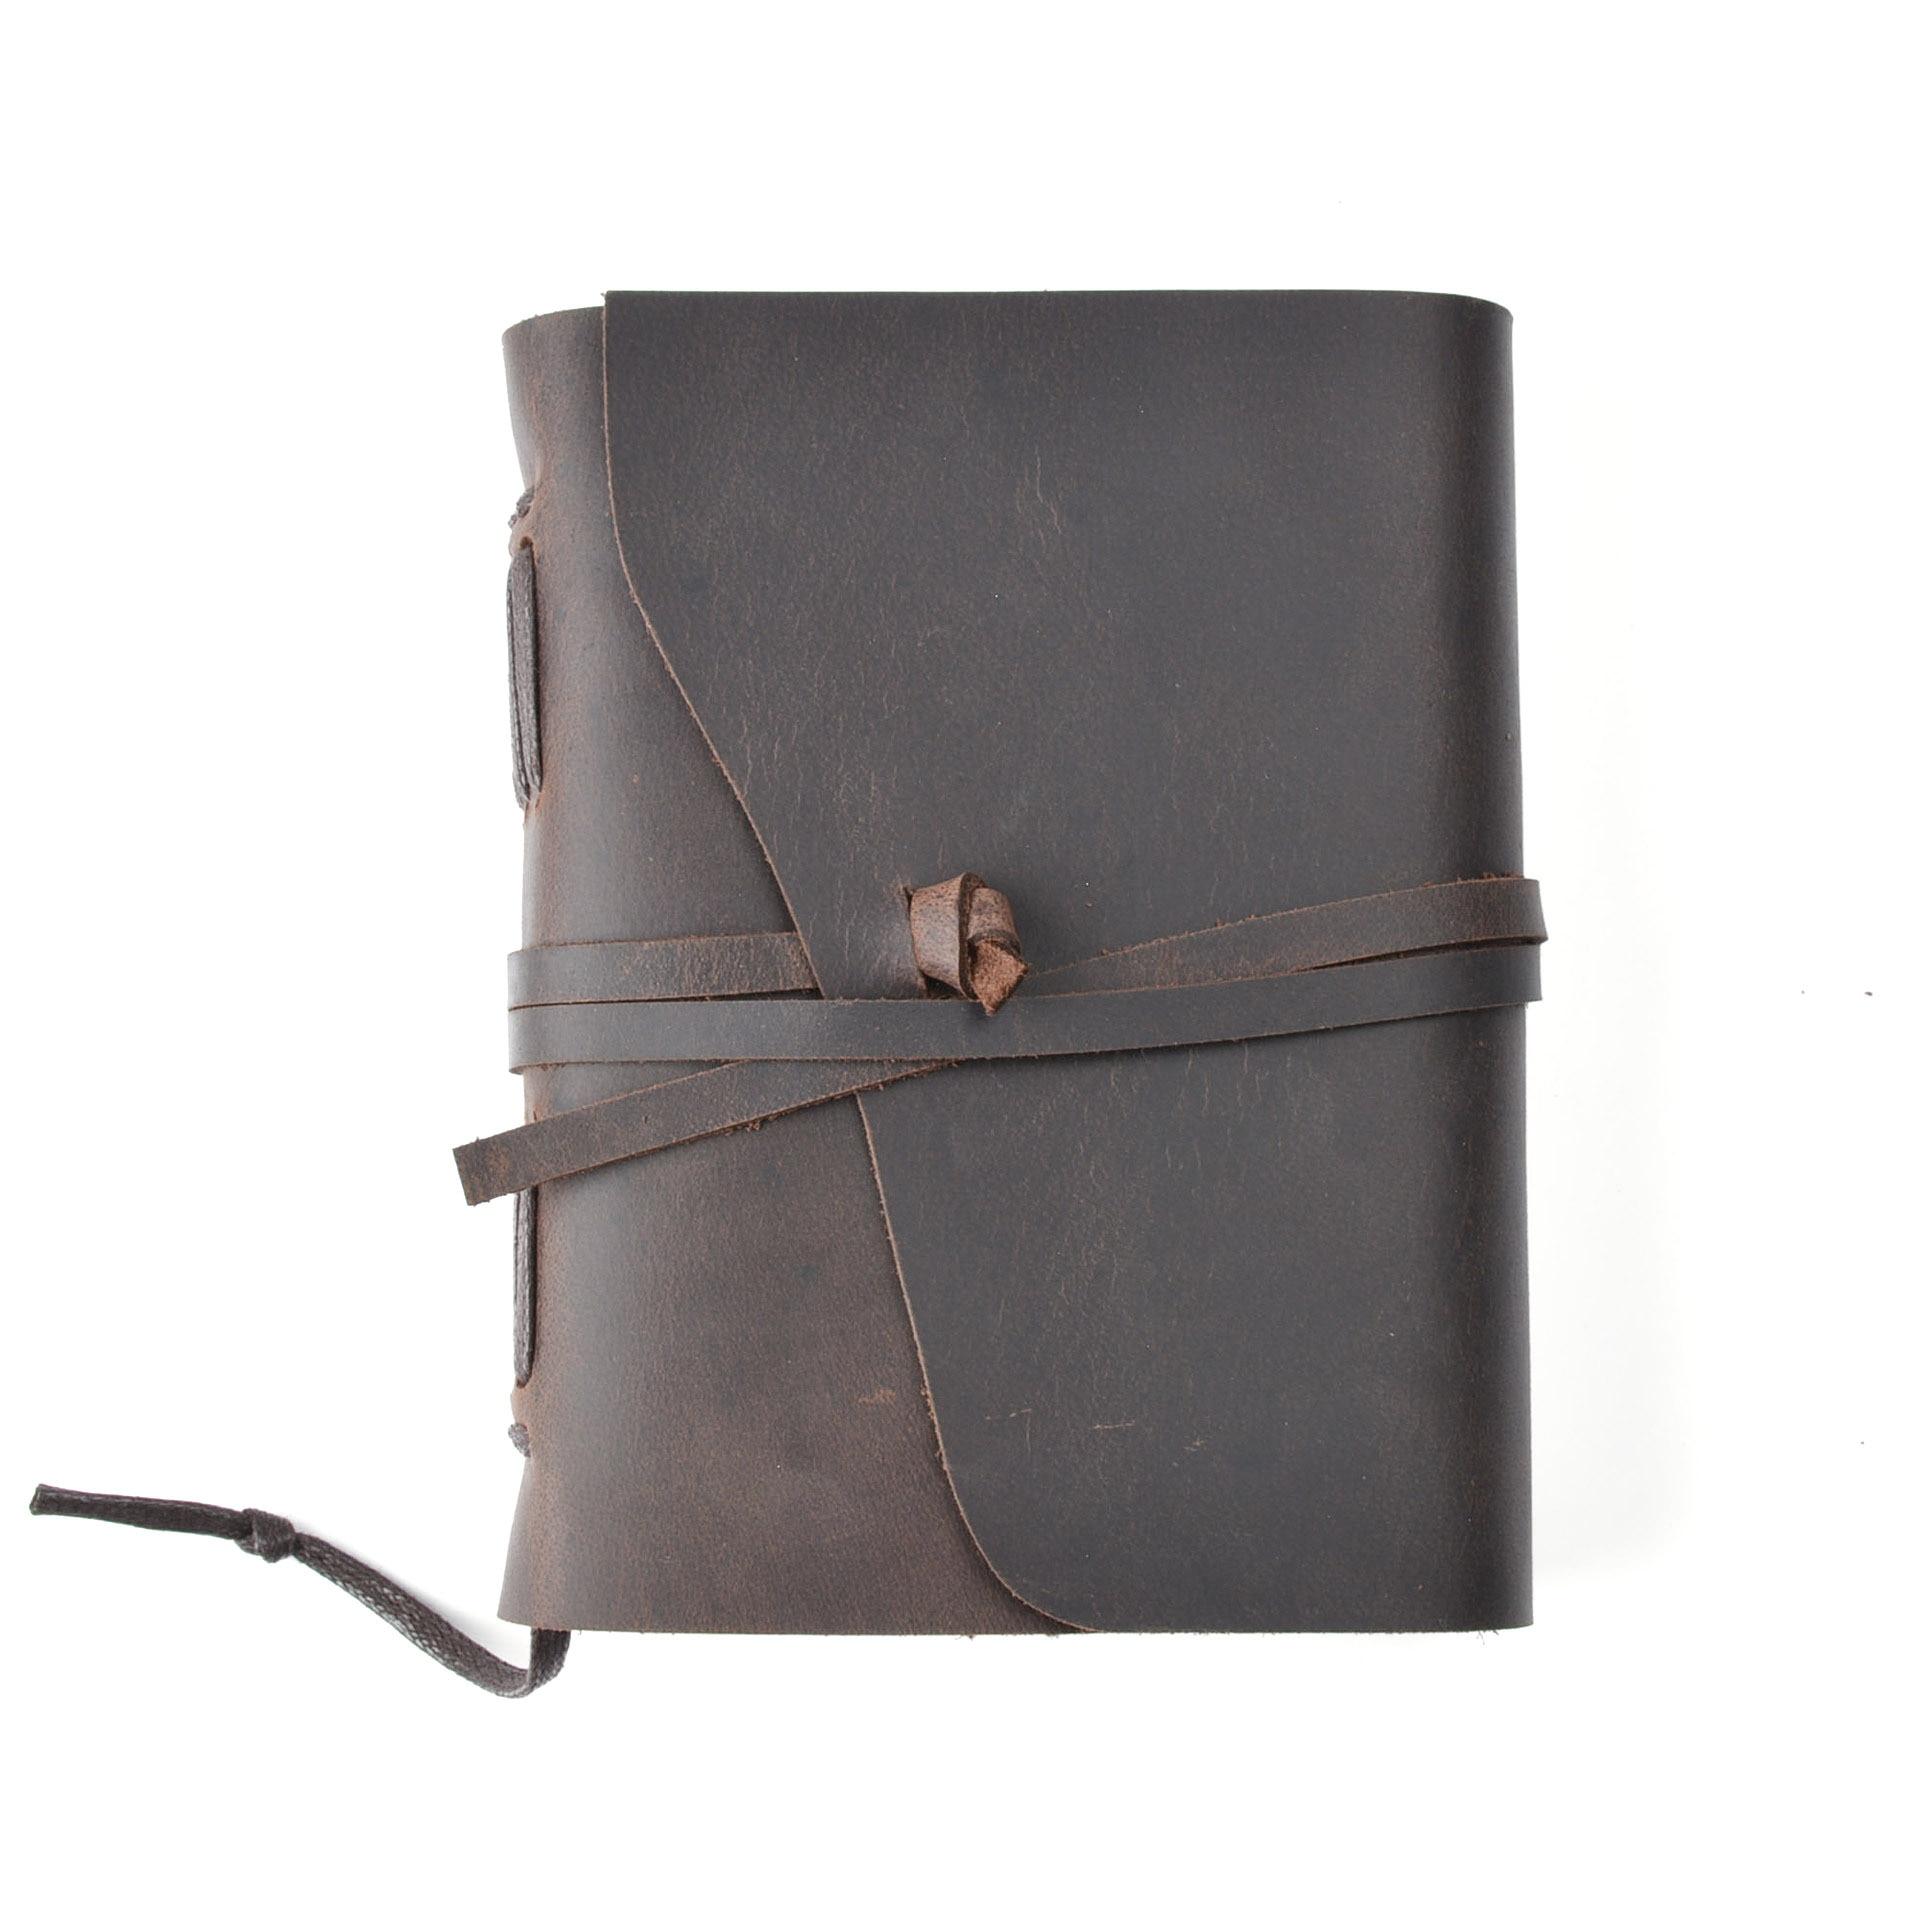 купить junetree Vintage Handmade Leather Diary Notebook Sketchbook Travel Journal Blank Writing Paper Note Books Gifts Stationery по цене 1931.81 рублей